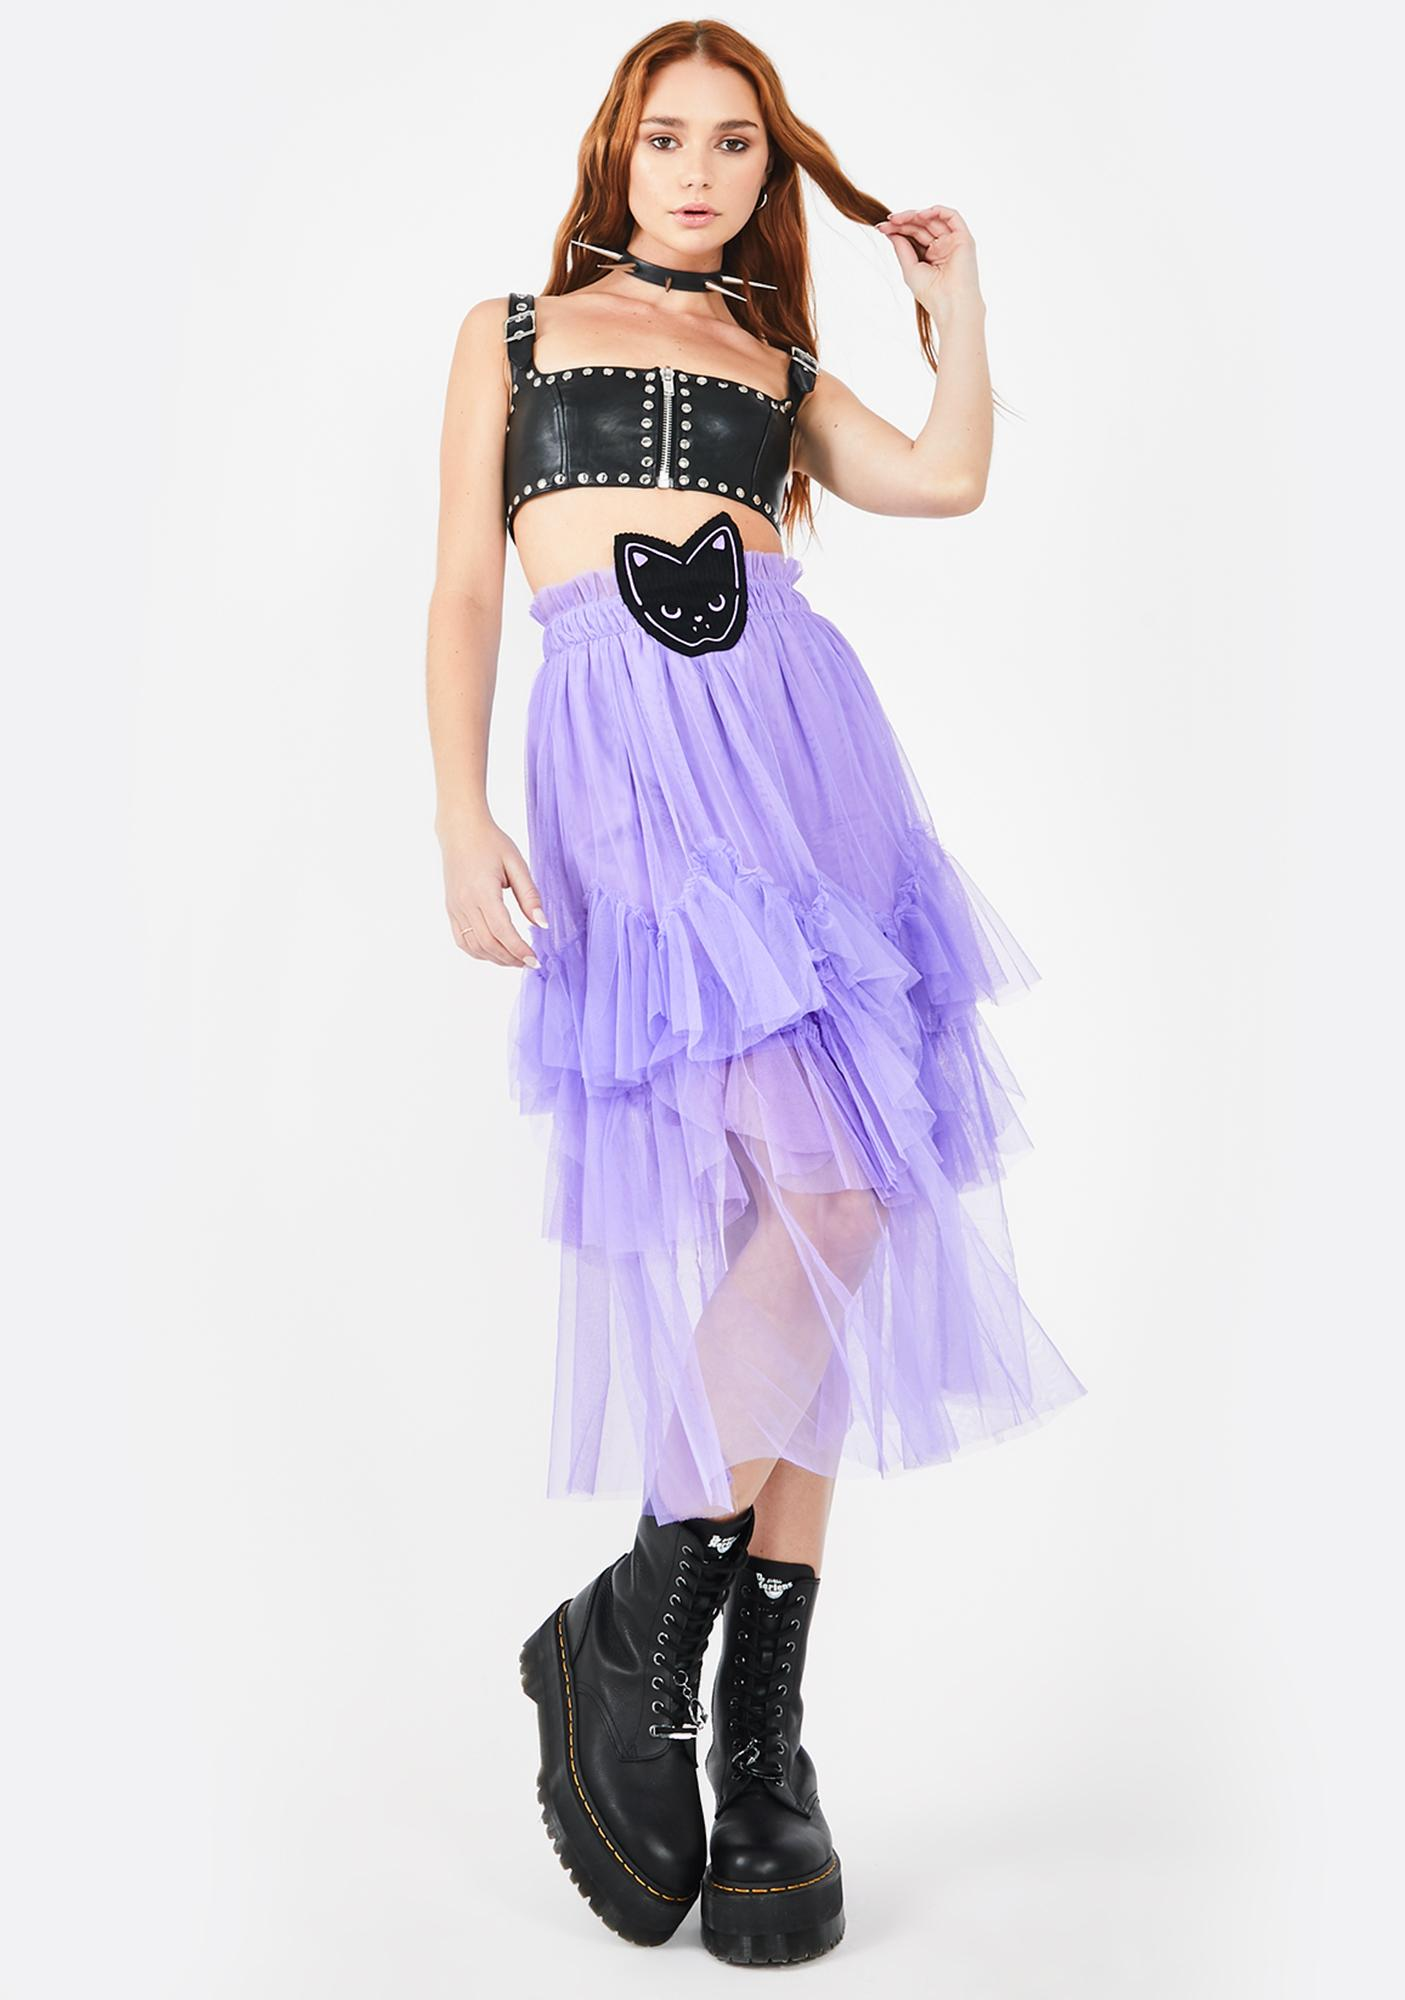 Morph8ne Purrrple Tutu Skirt